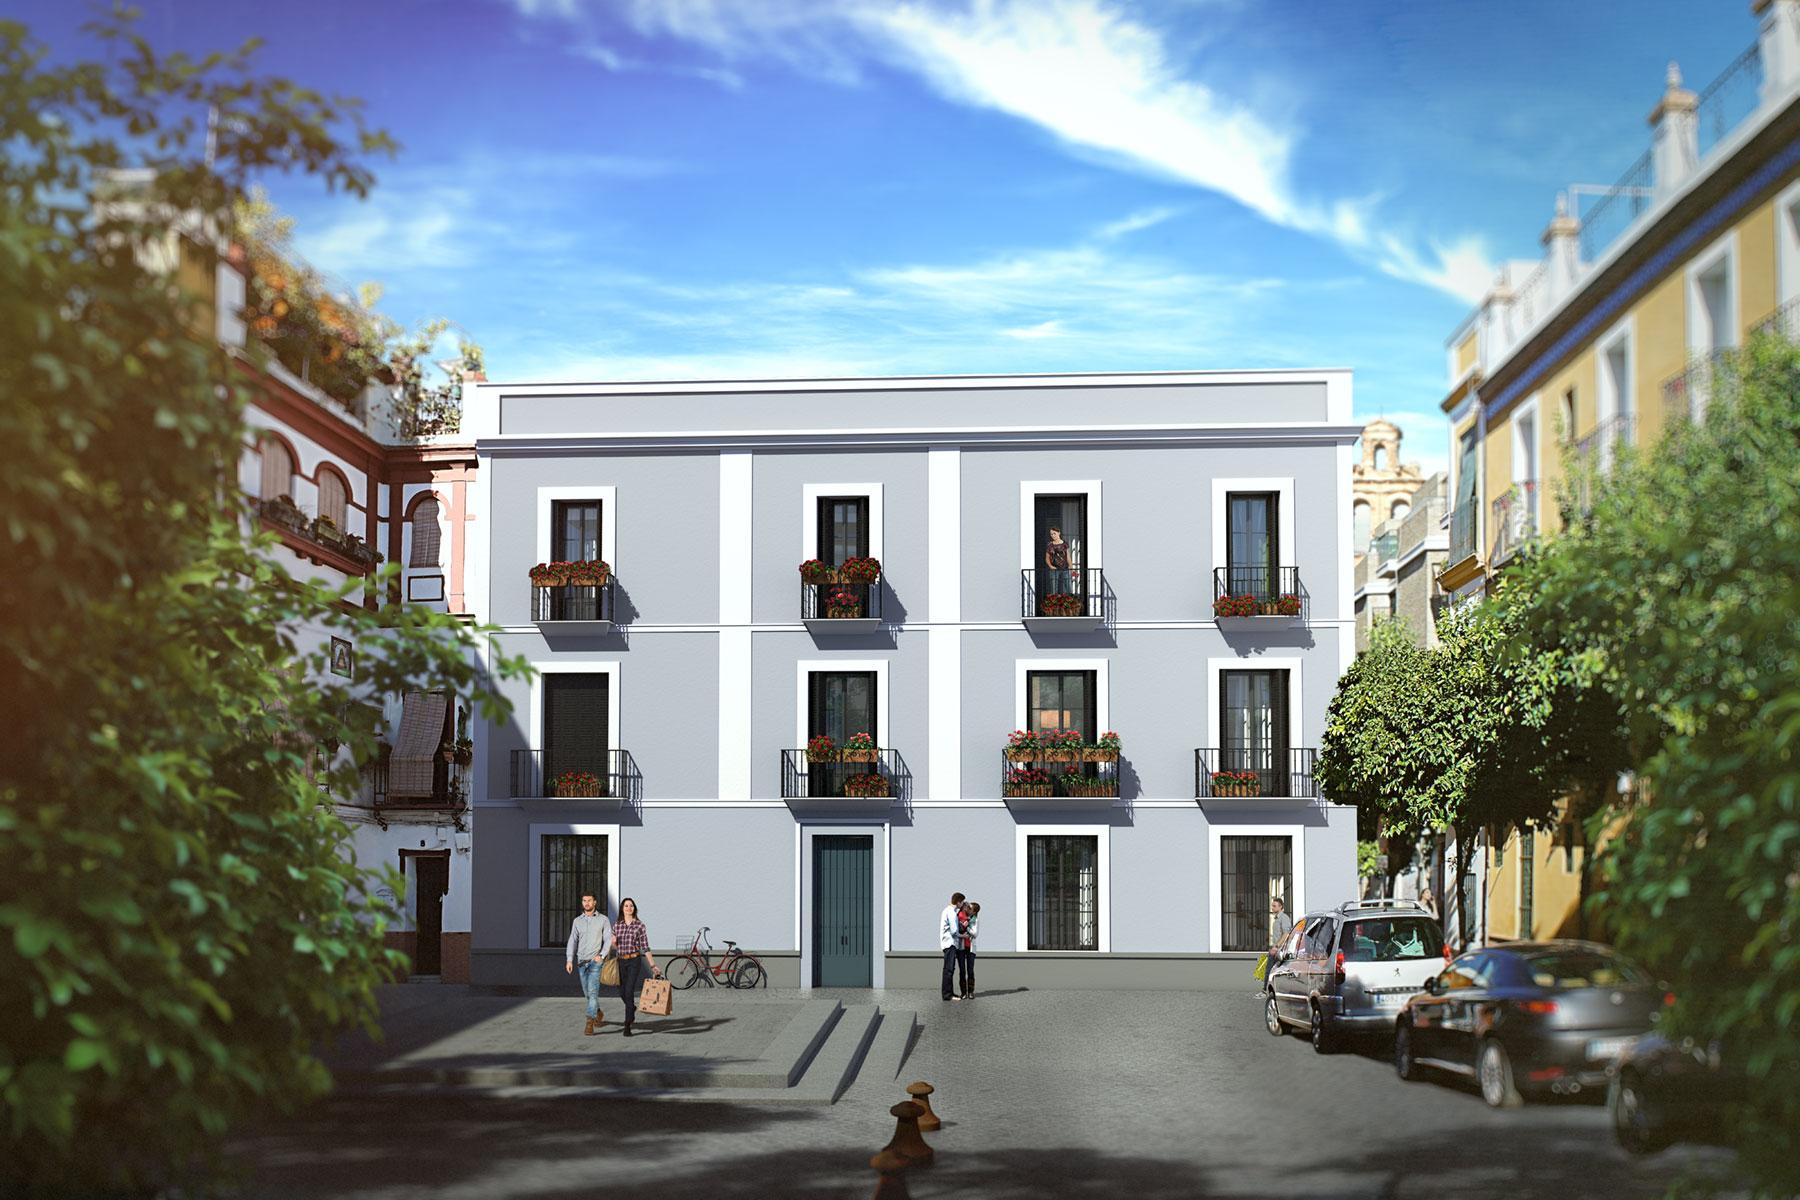 Edificio Almirante, Sevilla, fachada principal